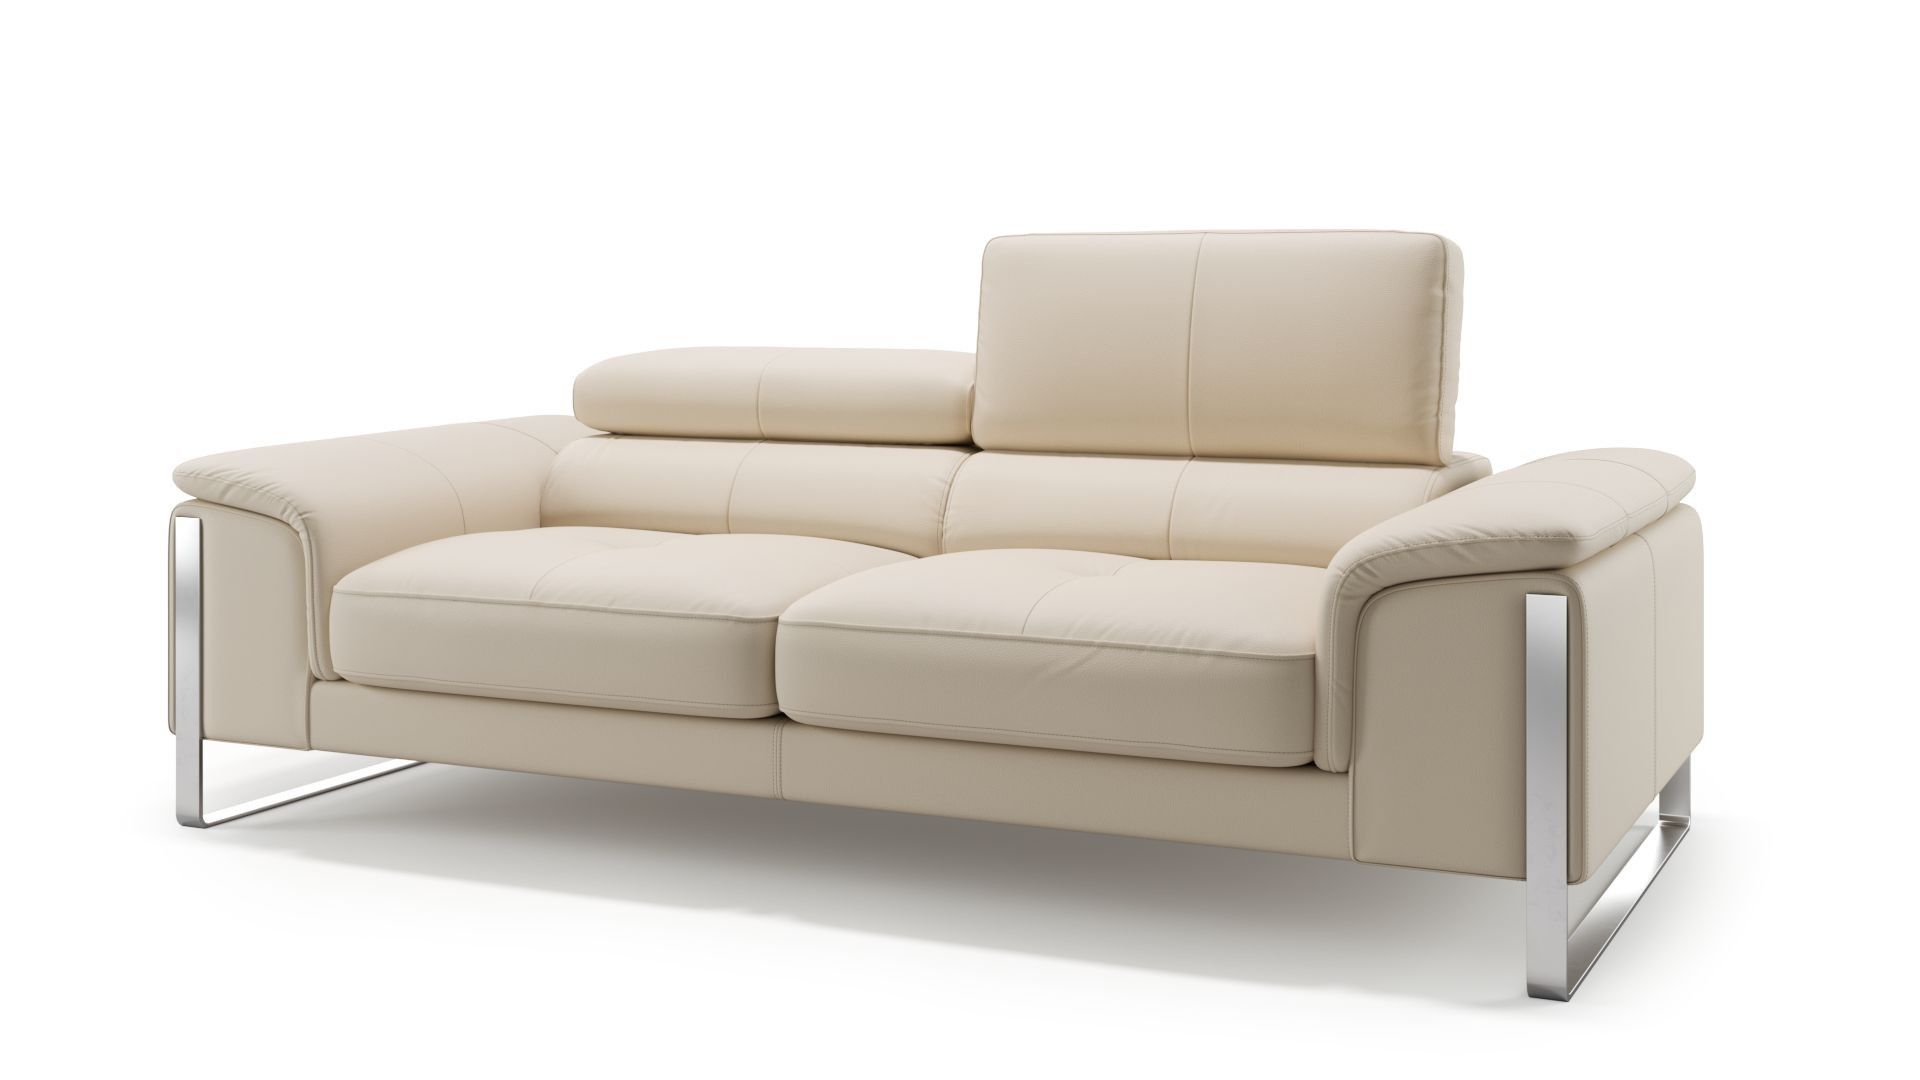 Sofa Material Inspirational Leder 3 Sitzer Pizolli Mit